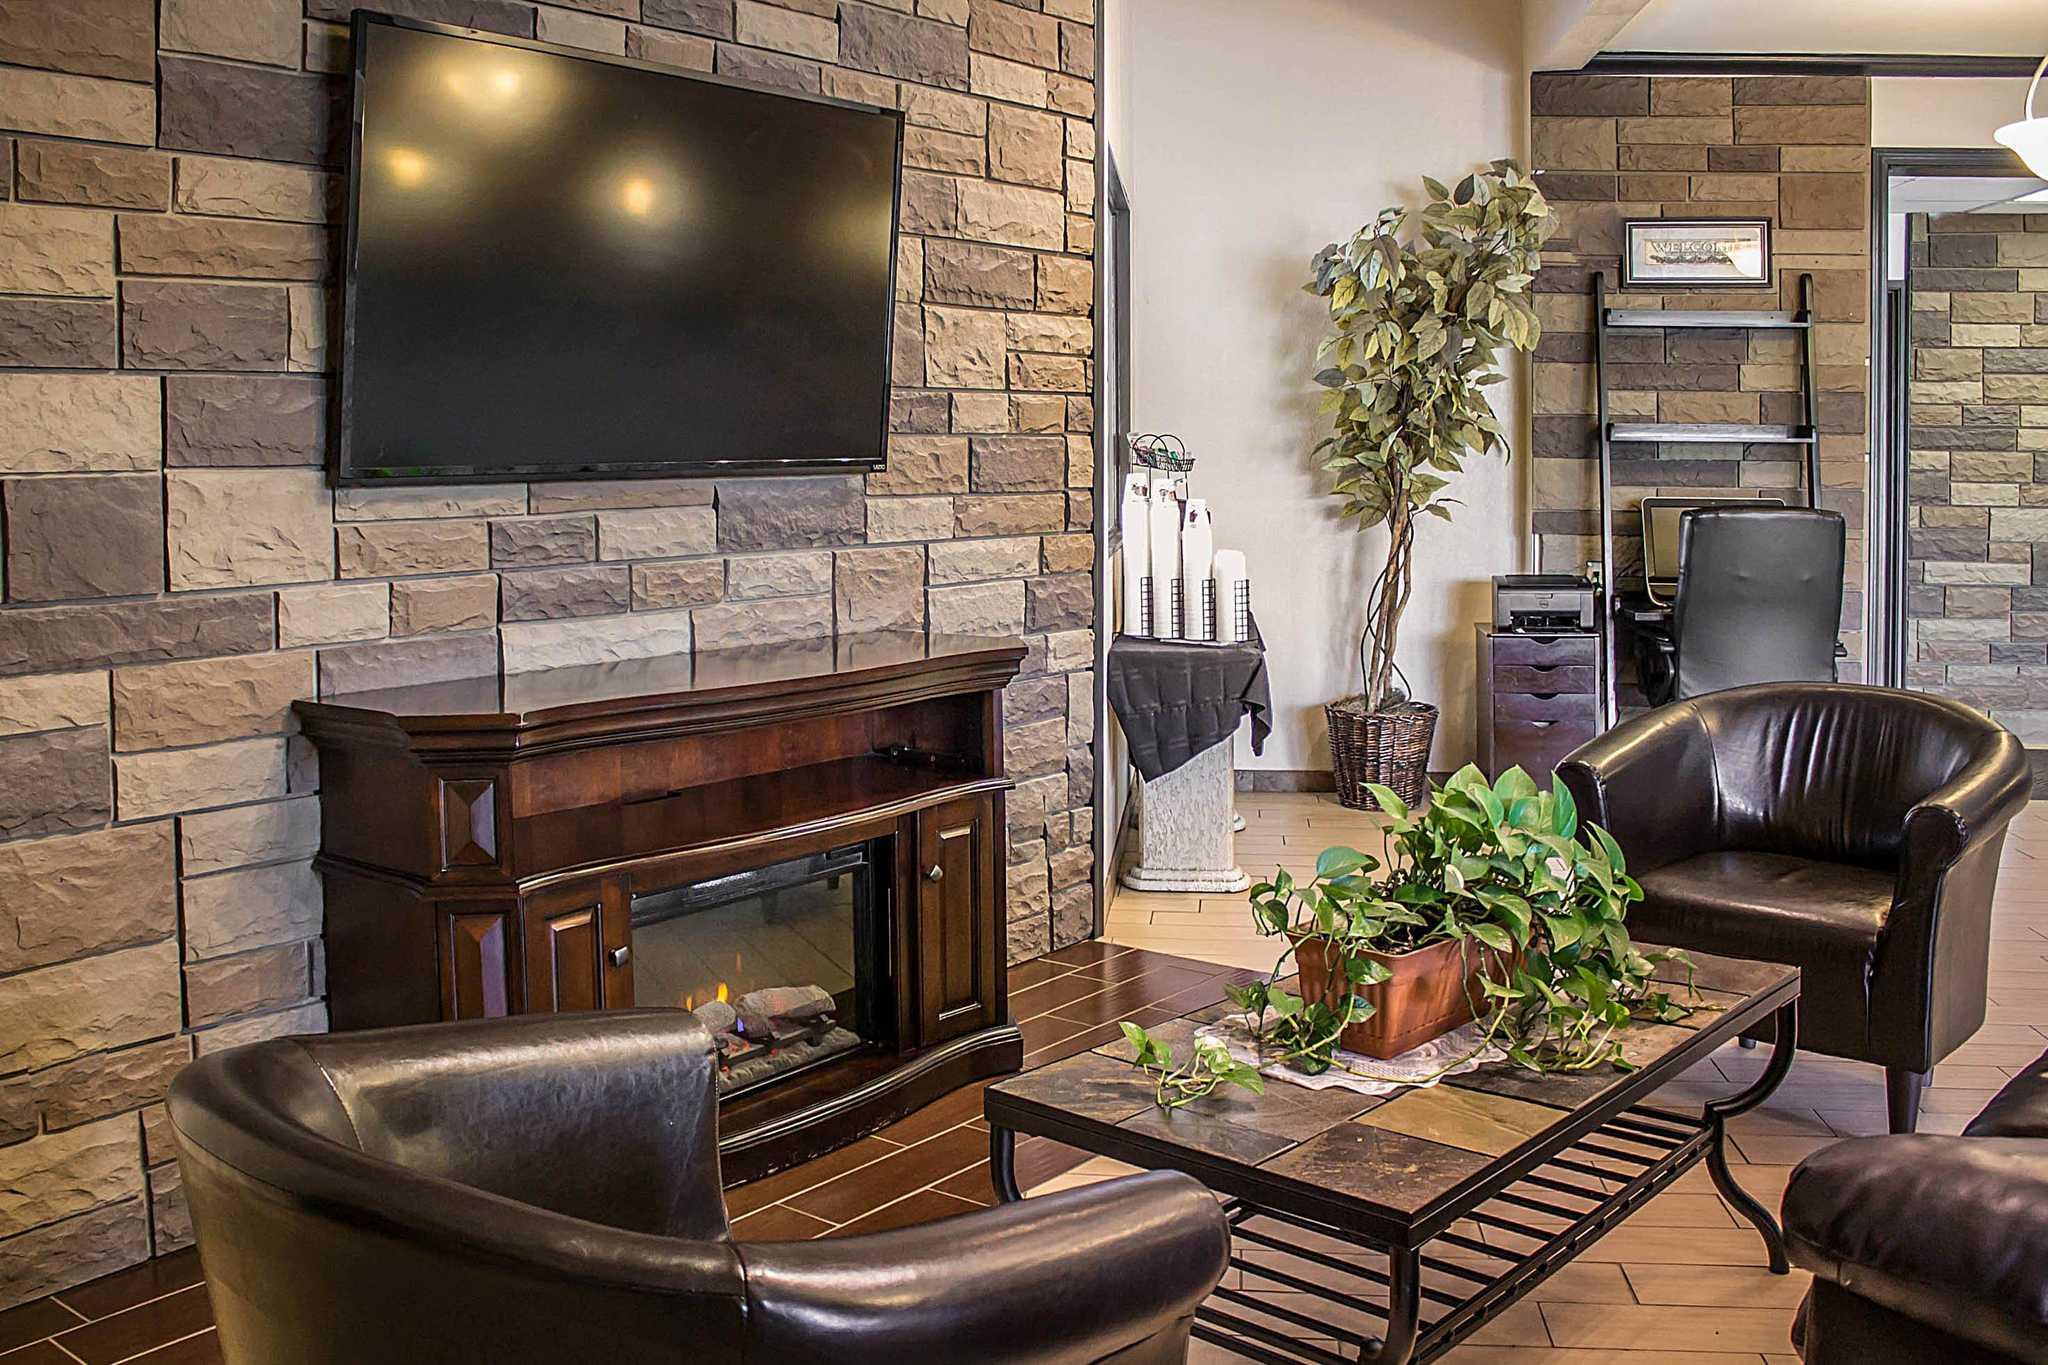 Quality Inn & Suites image 20